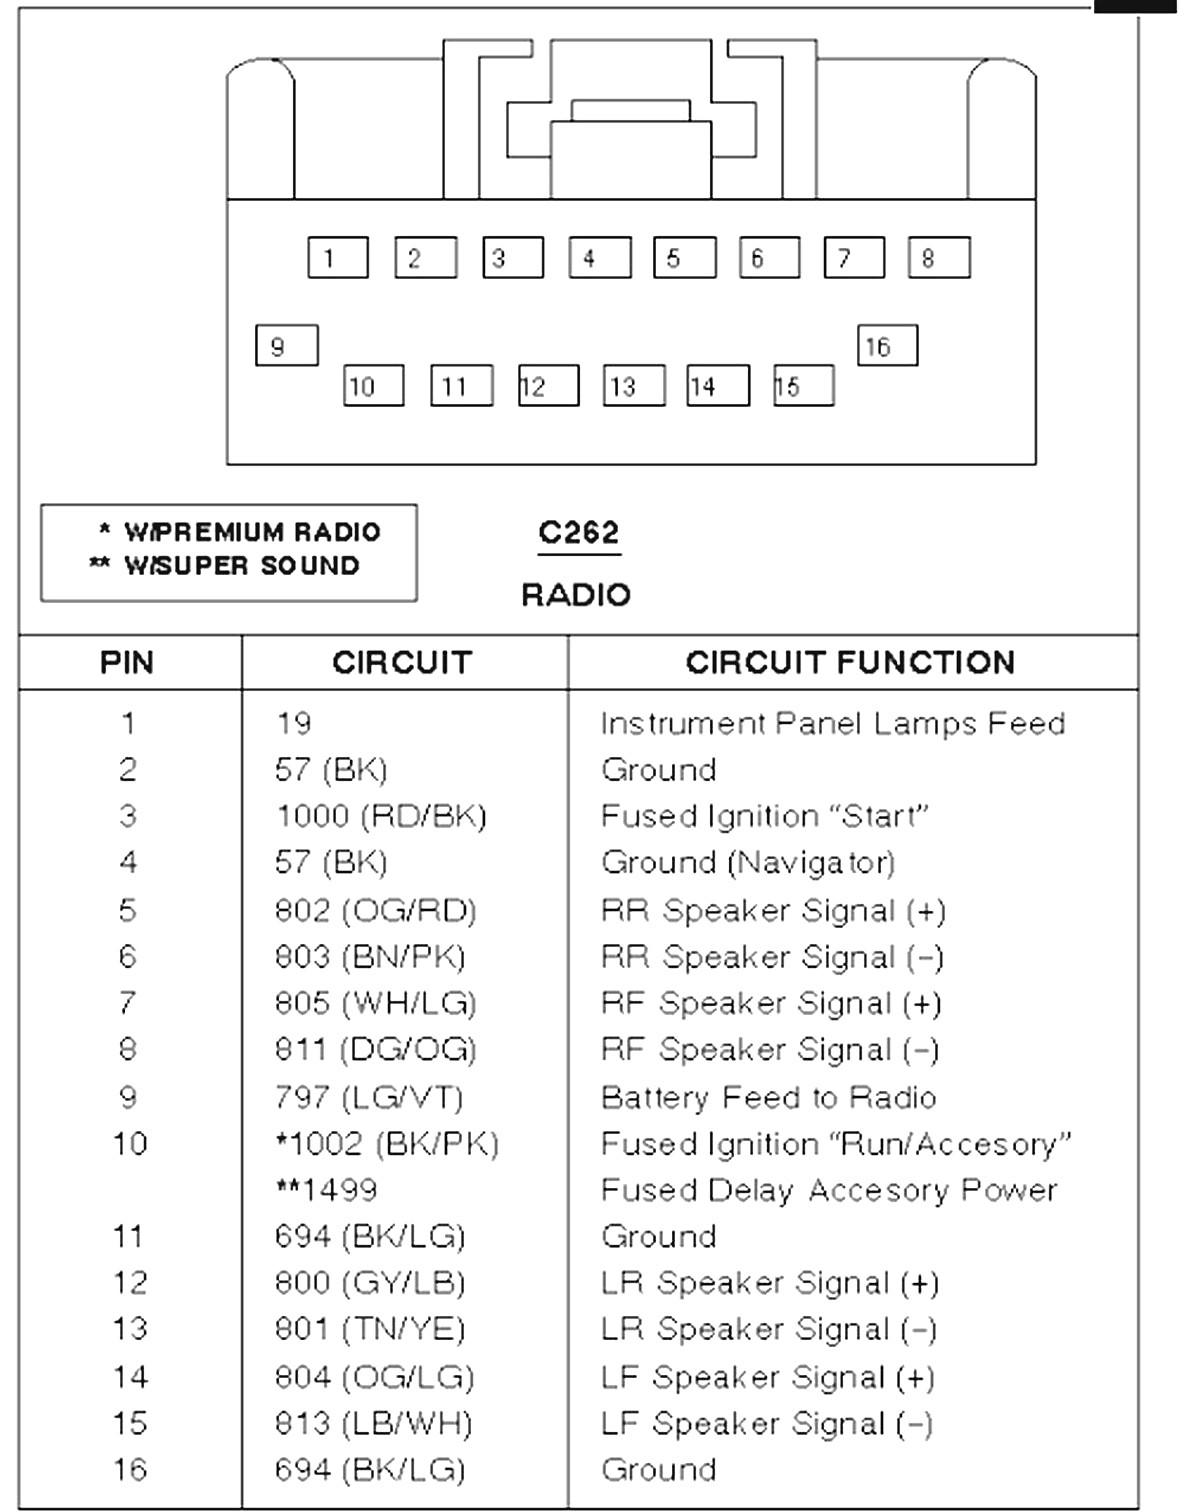 DIAGRAM] Wiring Diagram Pioneer Deh 150mp FULL Version HD Quality Deh 150mp  - BIUMEDIAGRAM.SKINE.FRSkine.fr